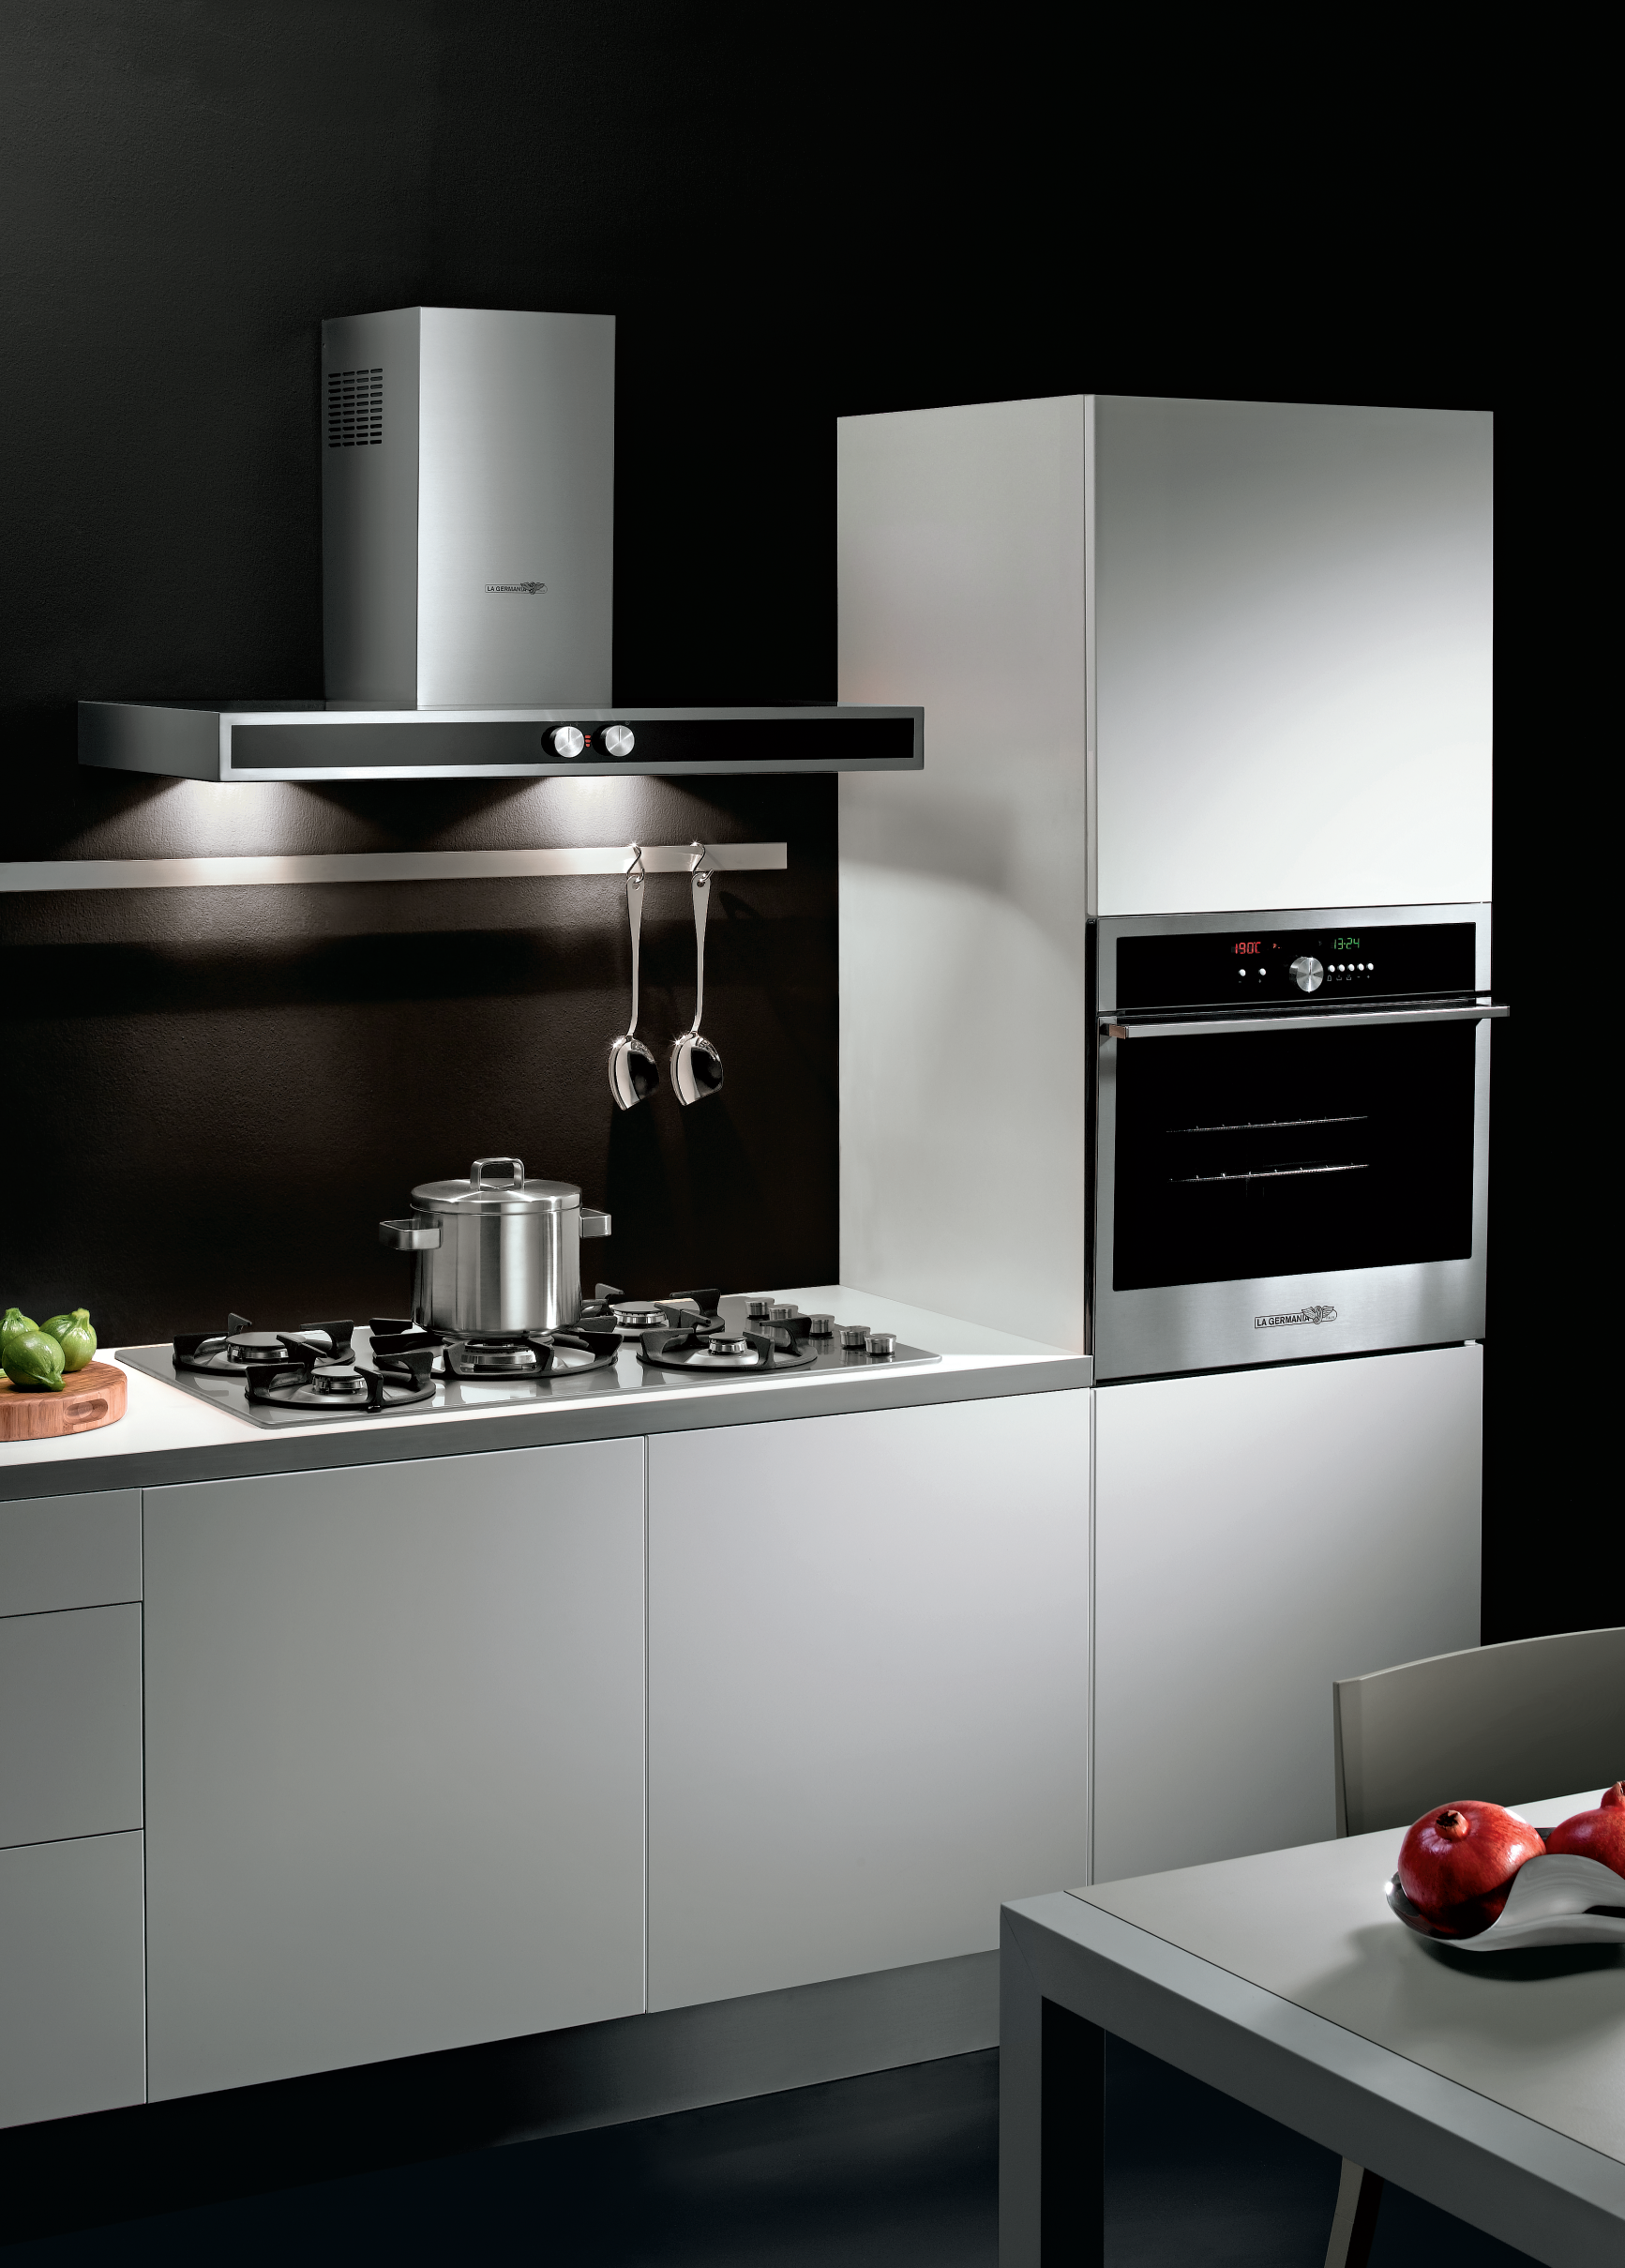 Iconic Appliances La Germania By Hafele La Germania By